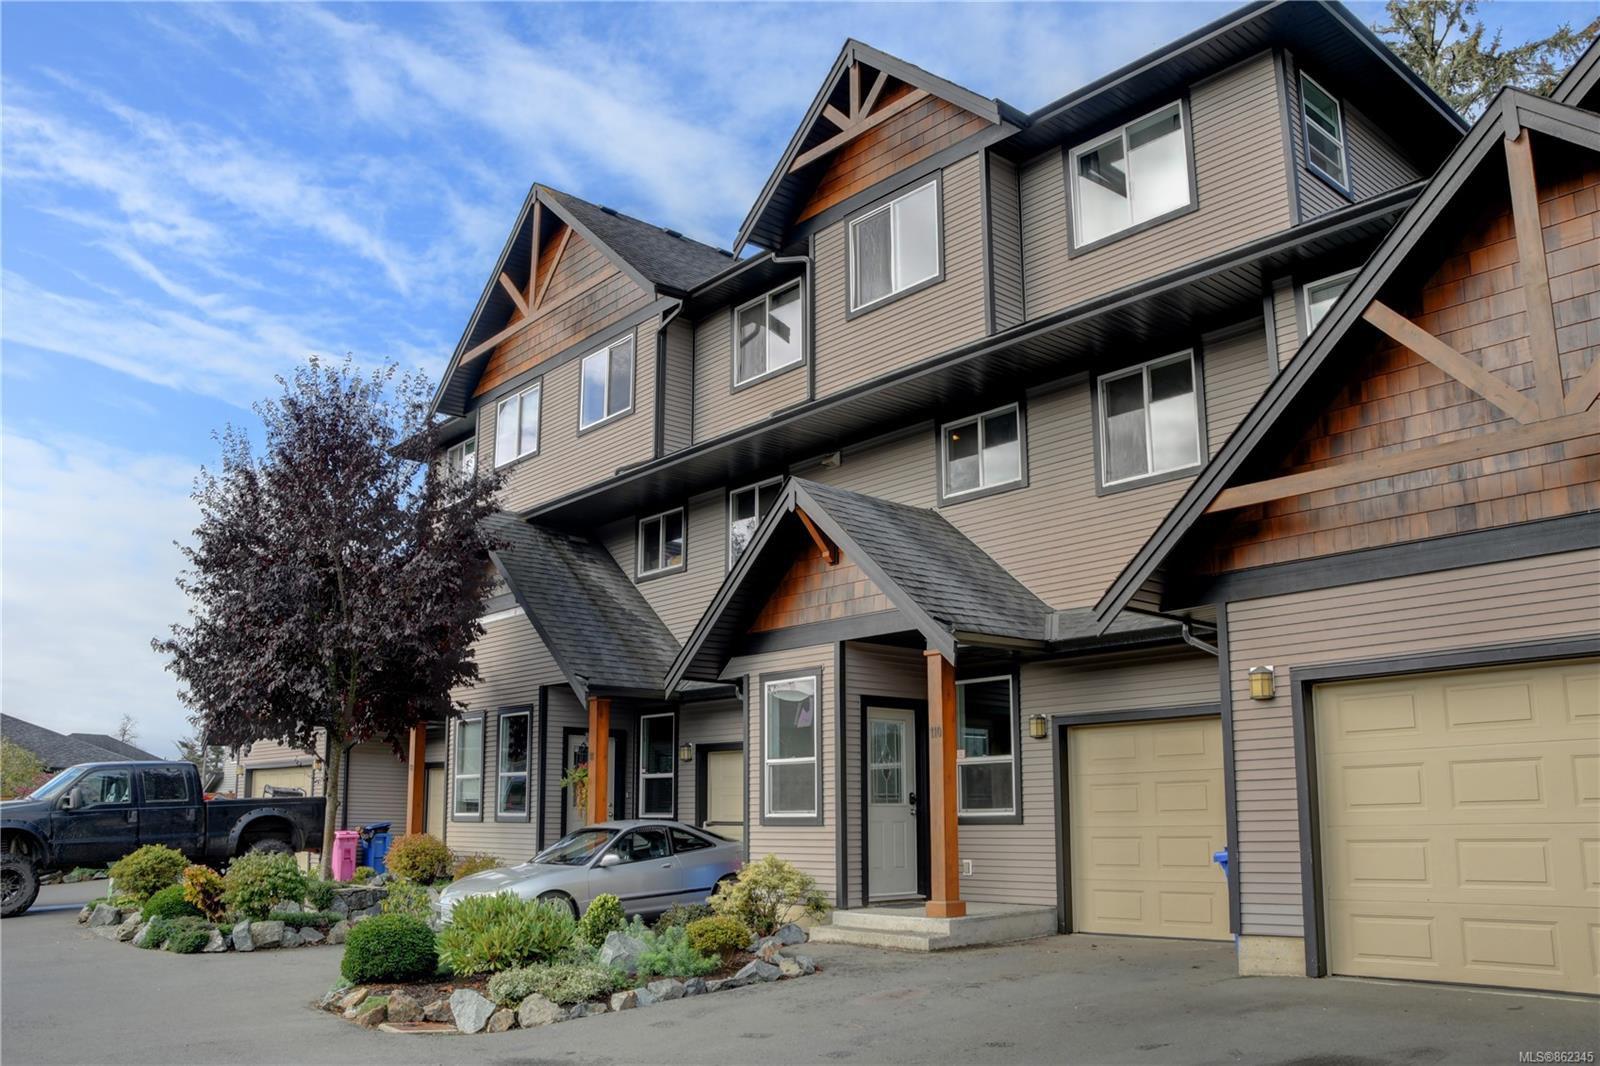 Main Photo: 110 1924 S Maple Ave in : Sk Sooke Vill Core Row/Townhouse for sale (Sooke)  : MLS®# 862345